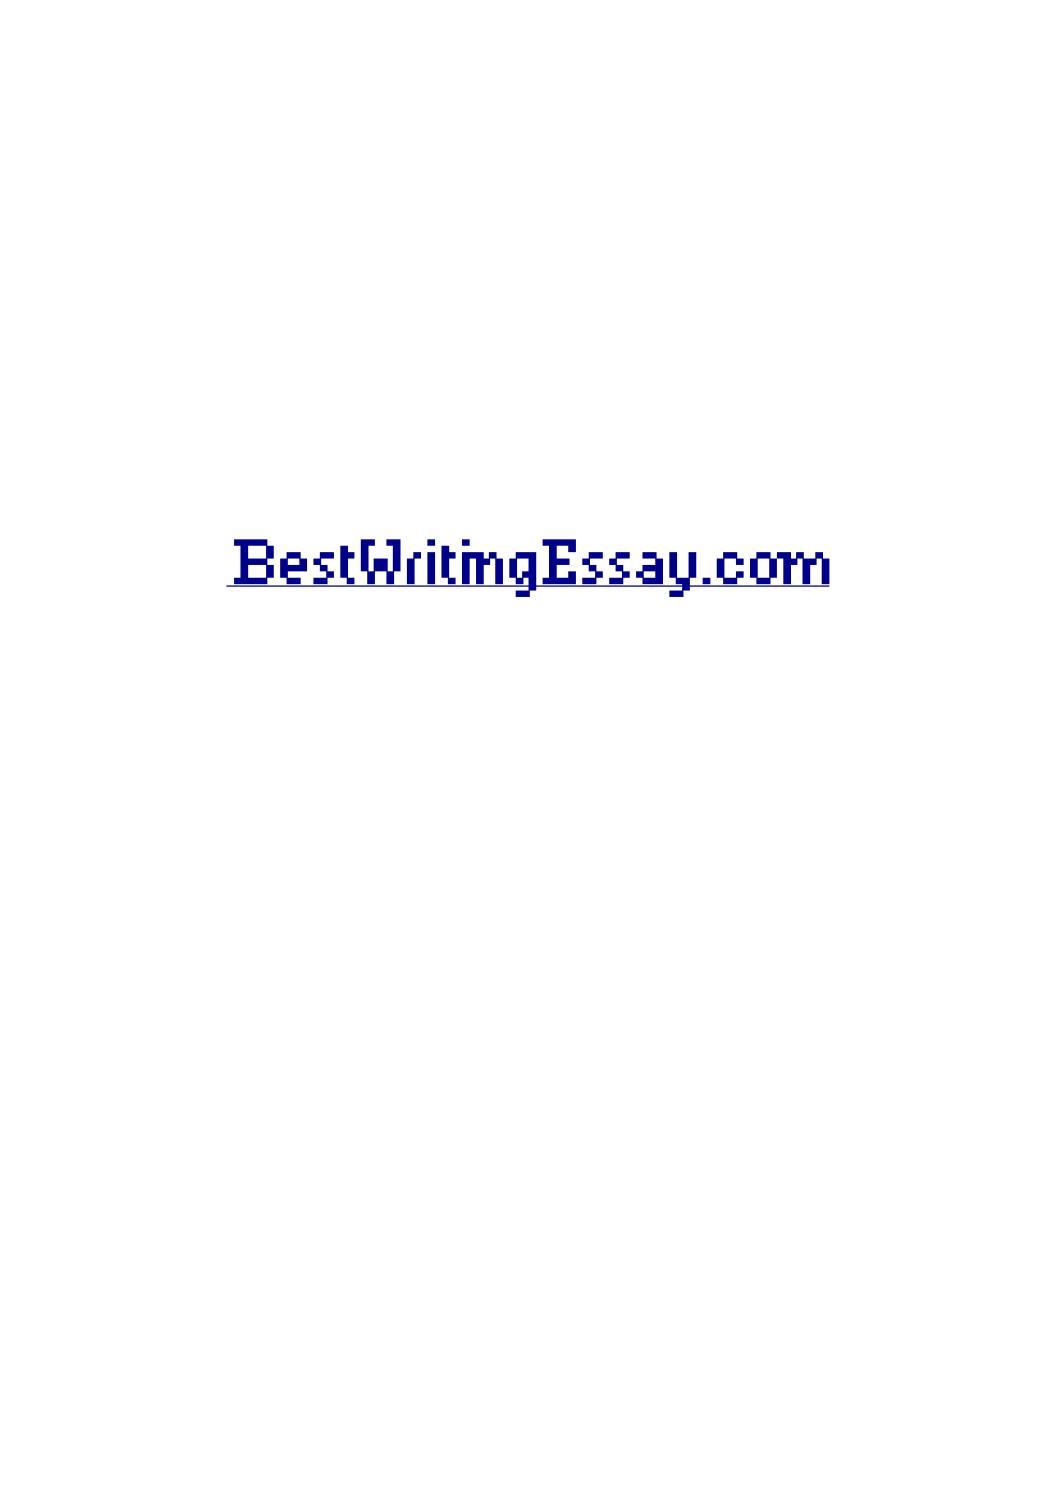 Equipment dealership service writer salary